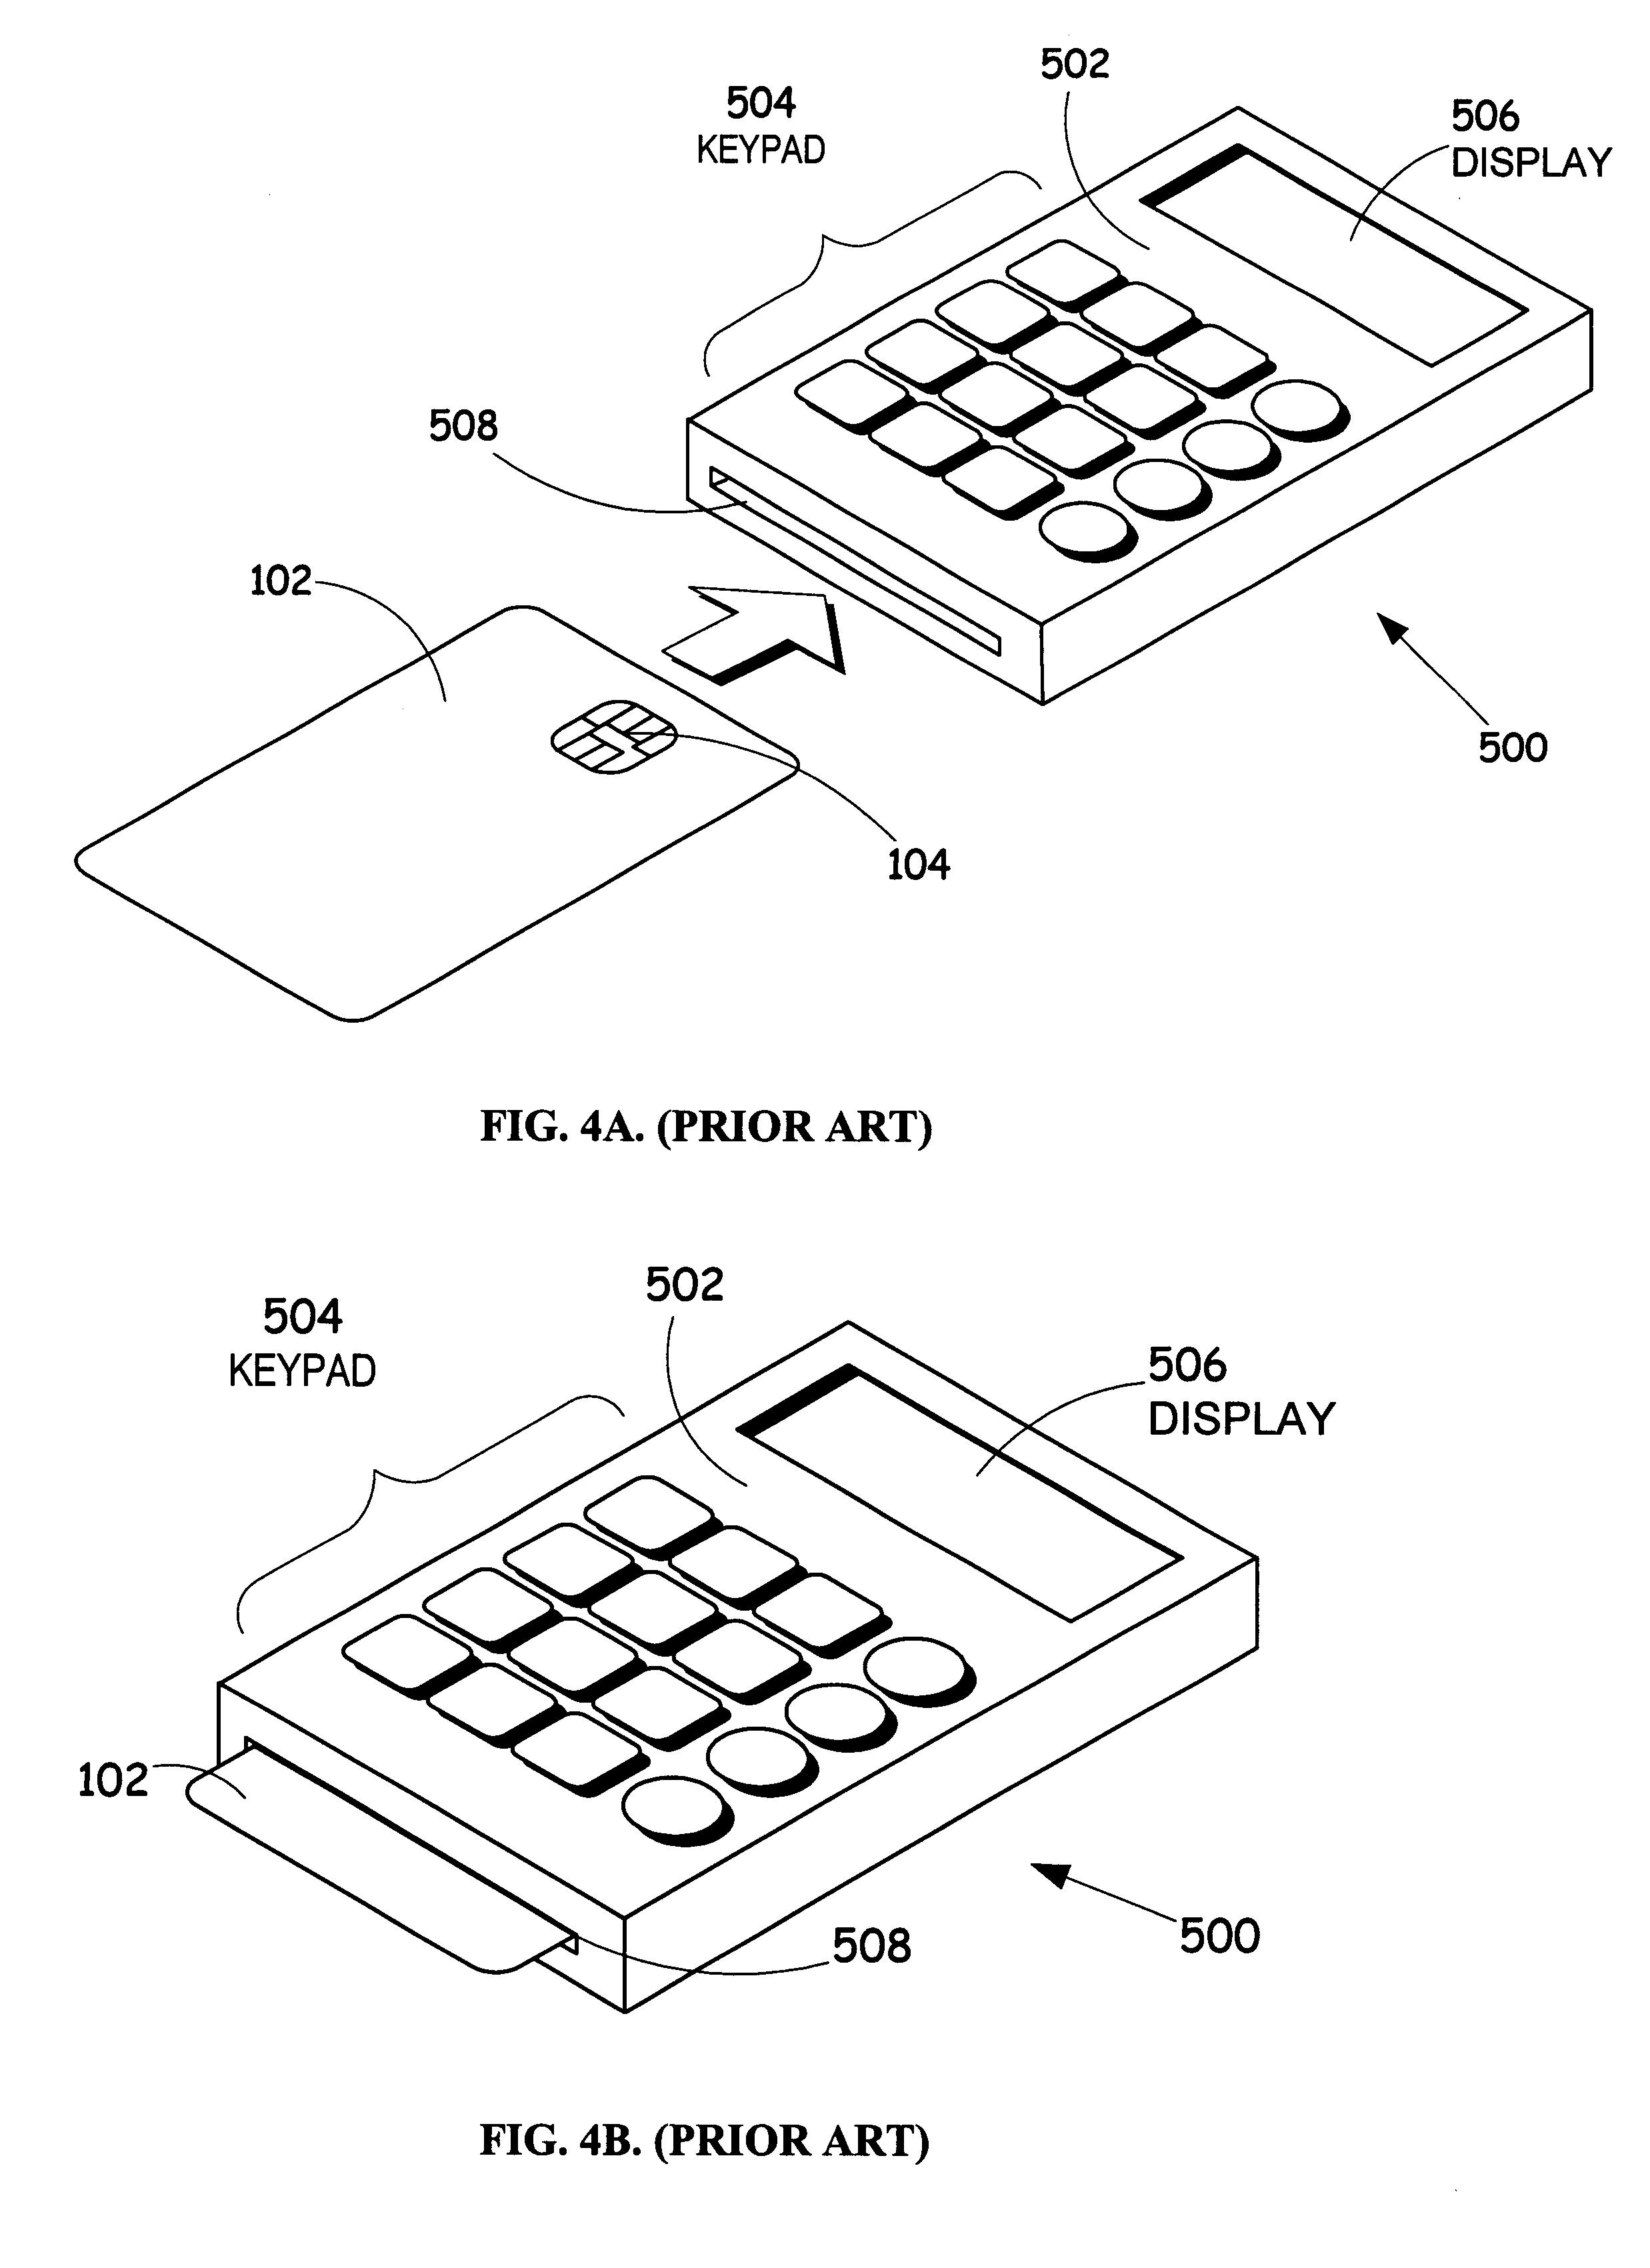 patent us 6 257 486 b1 FRP Diagram patent